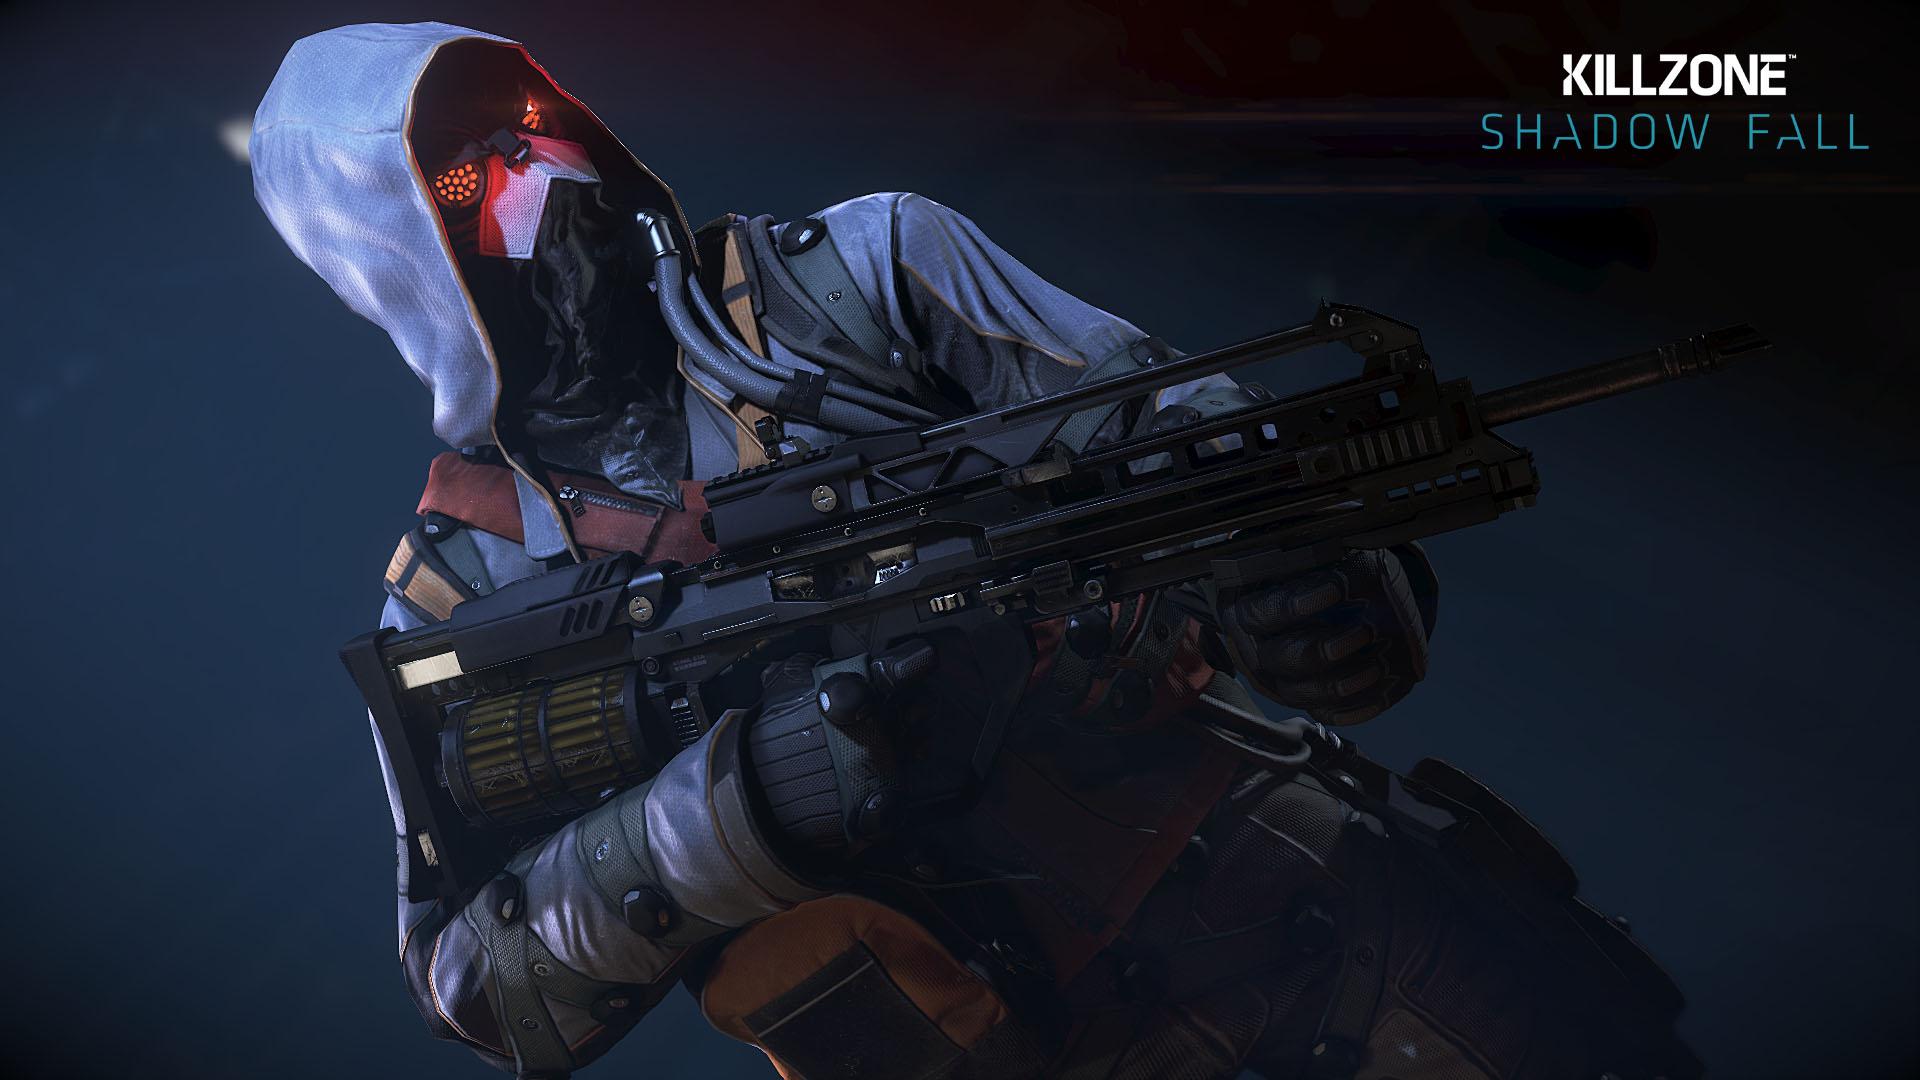 Killzone-ShadowFall PS4 Visuel 005